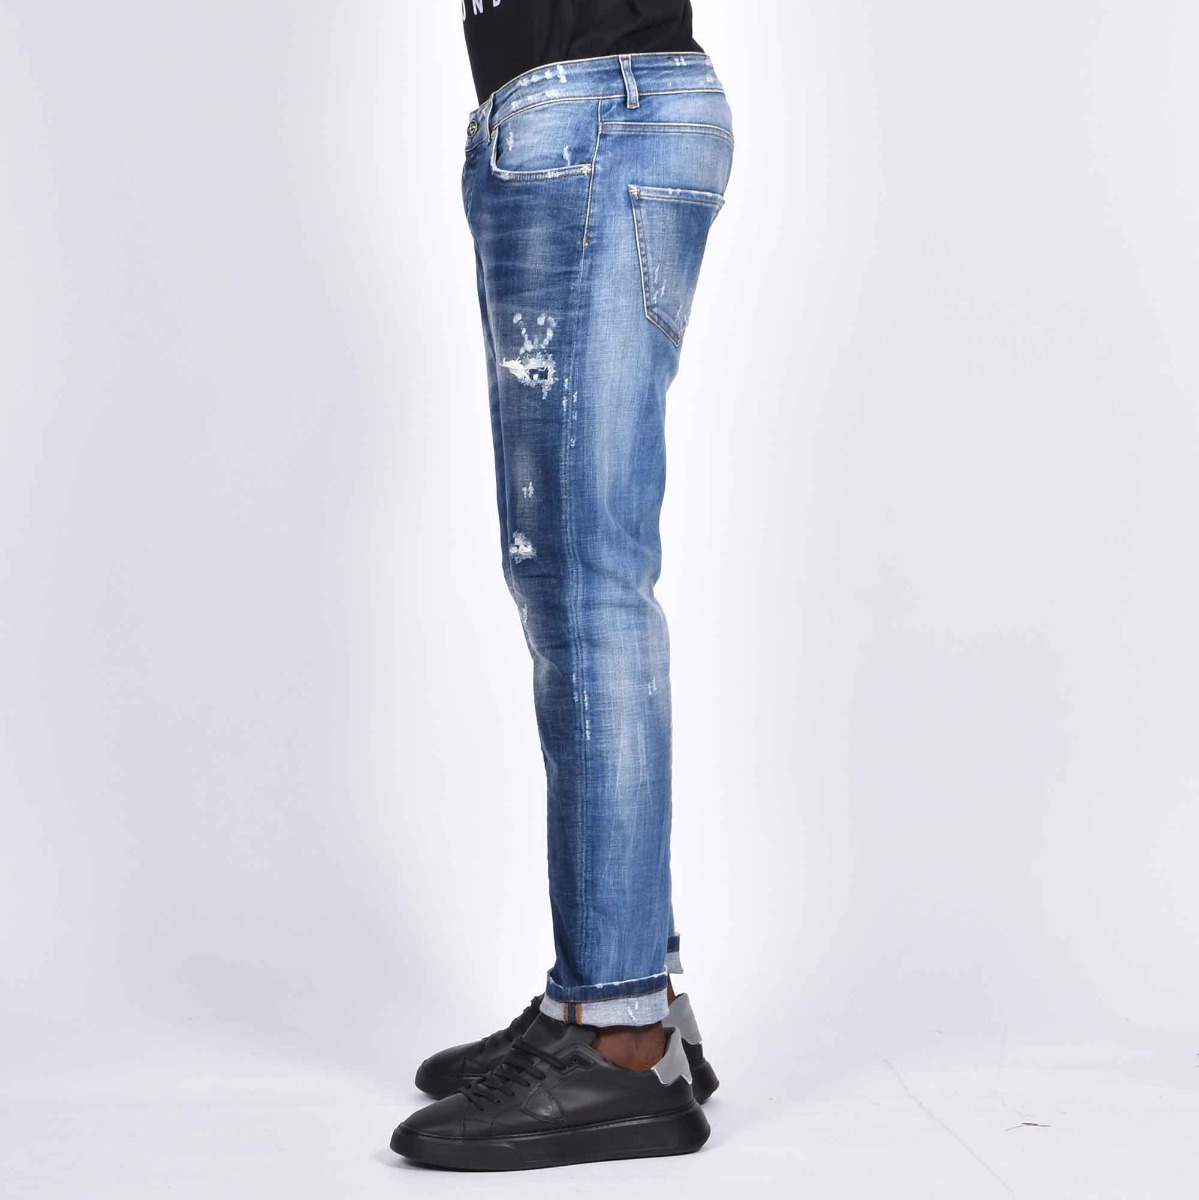 Jeans yukon - Denim medio